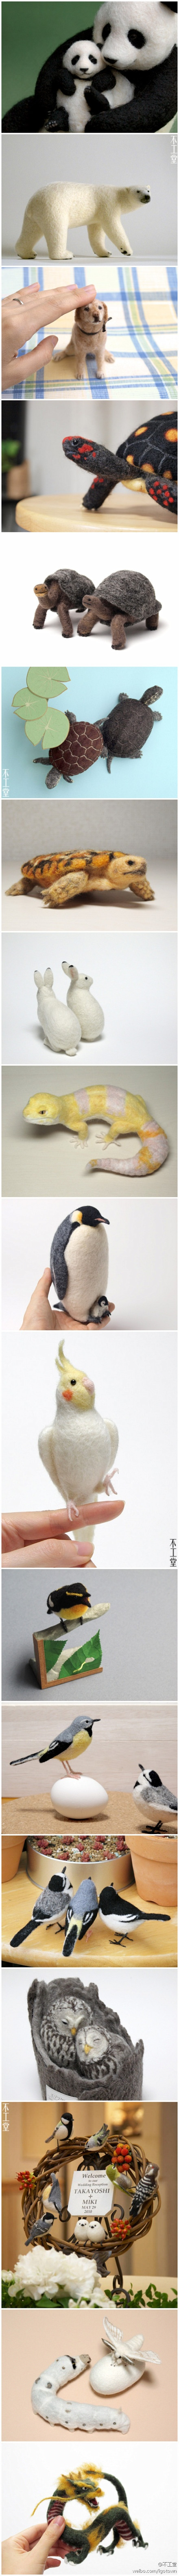 Panda, bear, turtle, dog, rabbit, lizard, penguin, bird, owl, moth, caterpillar, dragon - look at these from Naito beauty is realistic style animal work